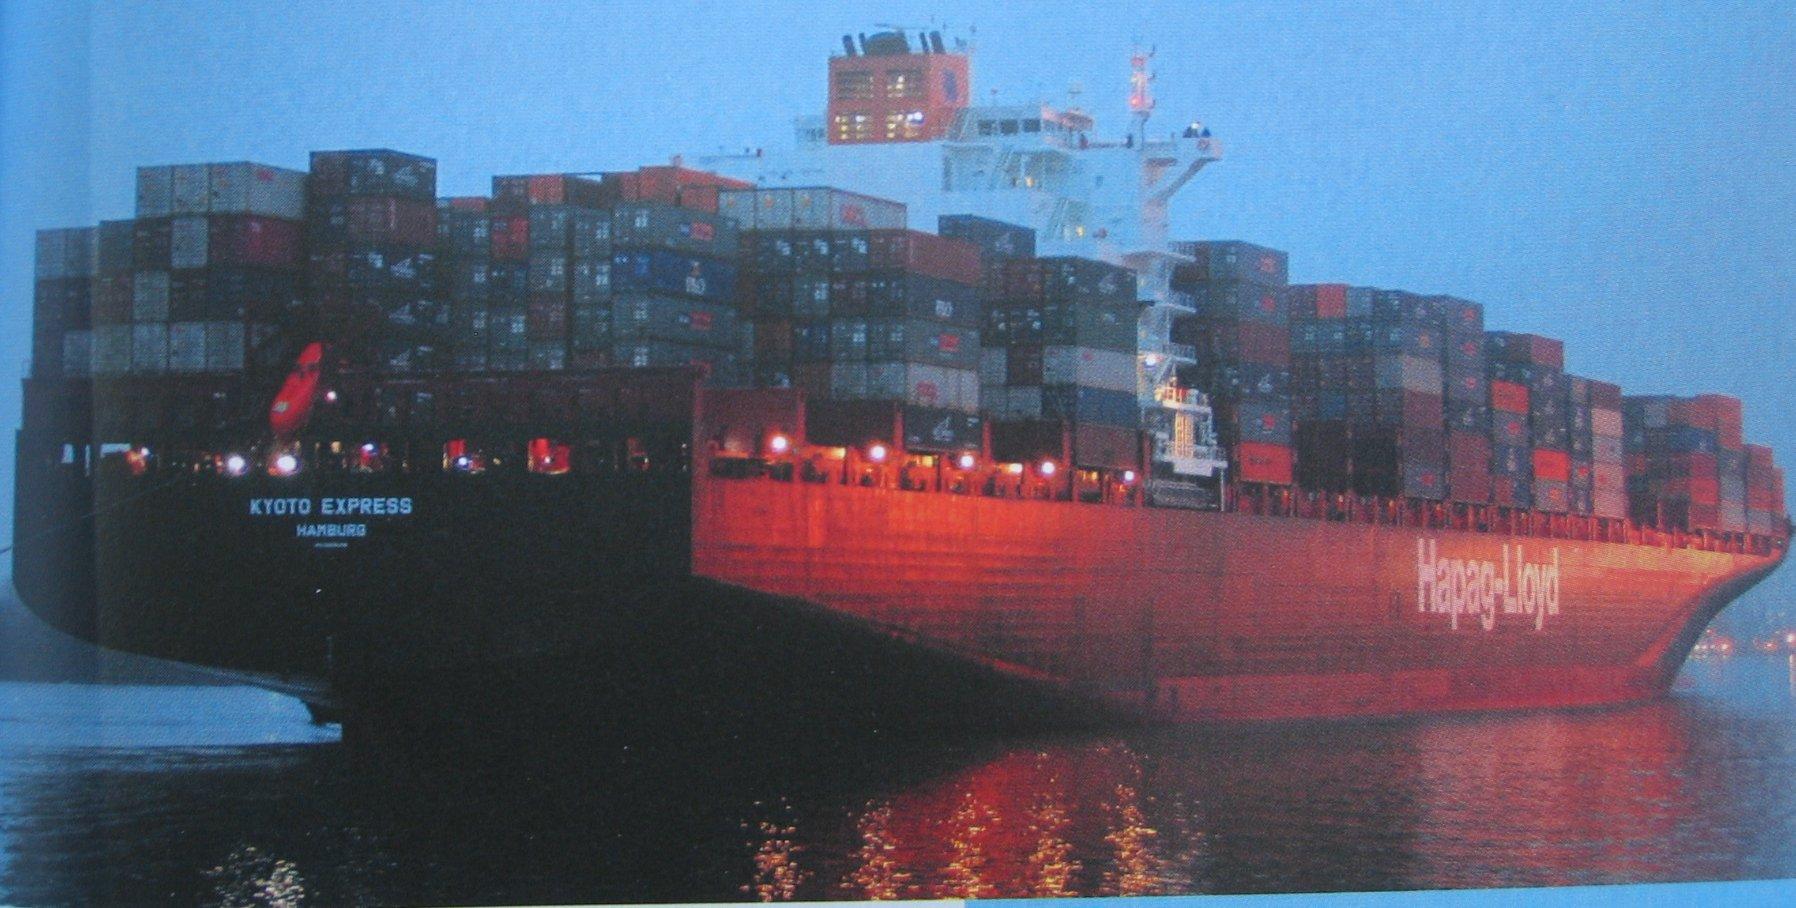 75947_Container0_Enviromental_122_585lo.JPG